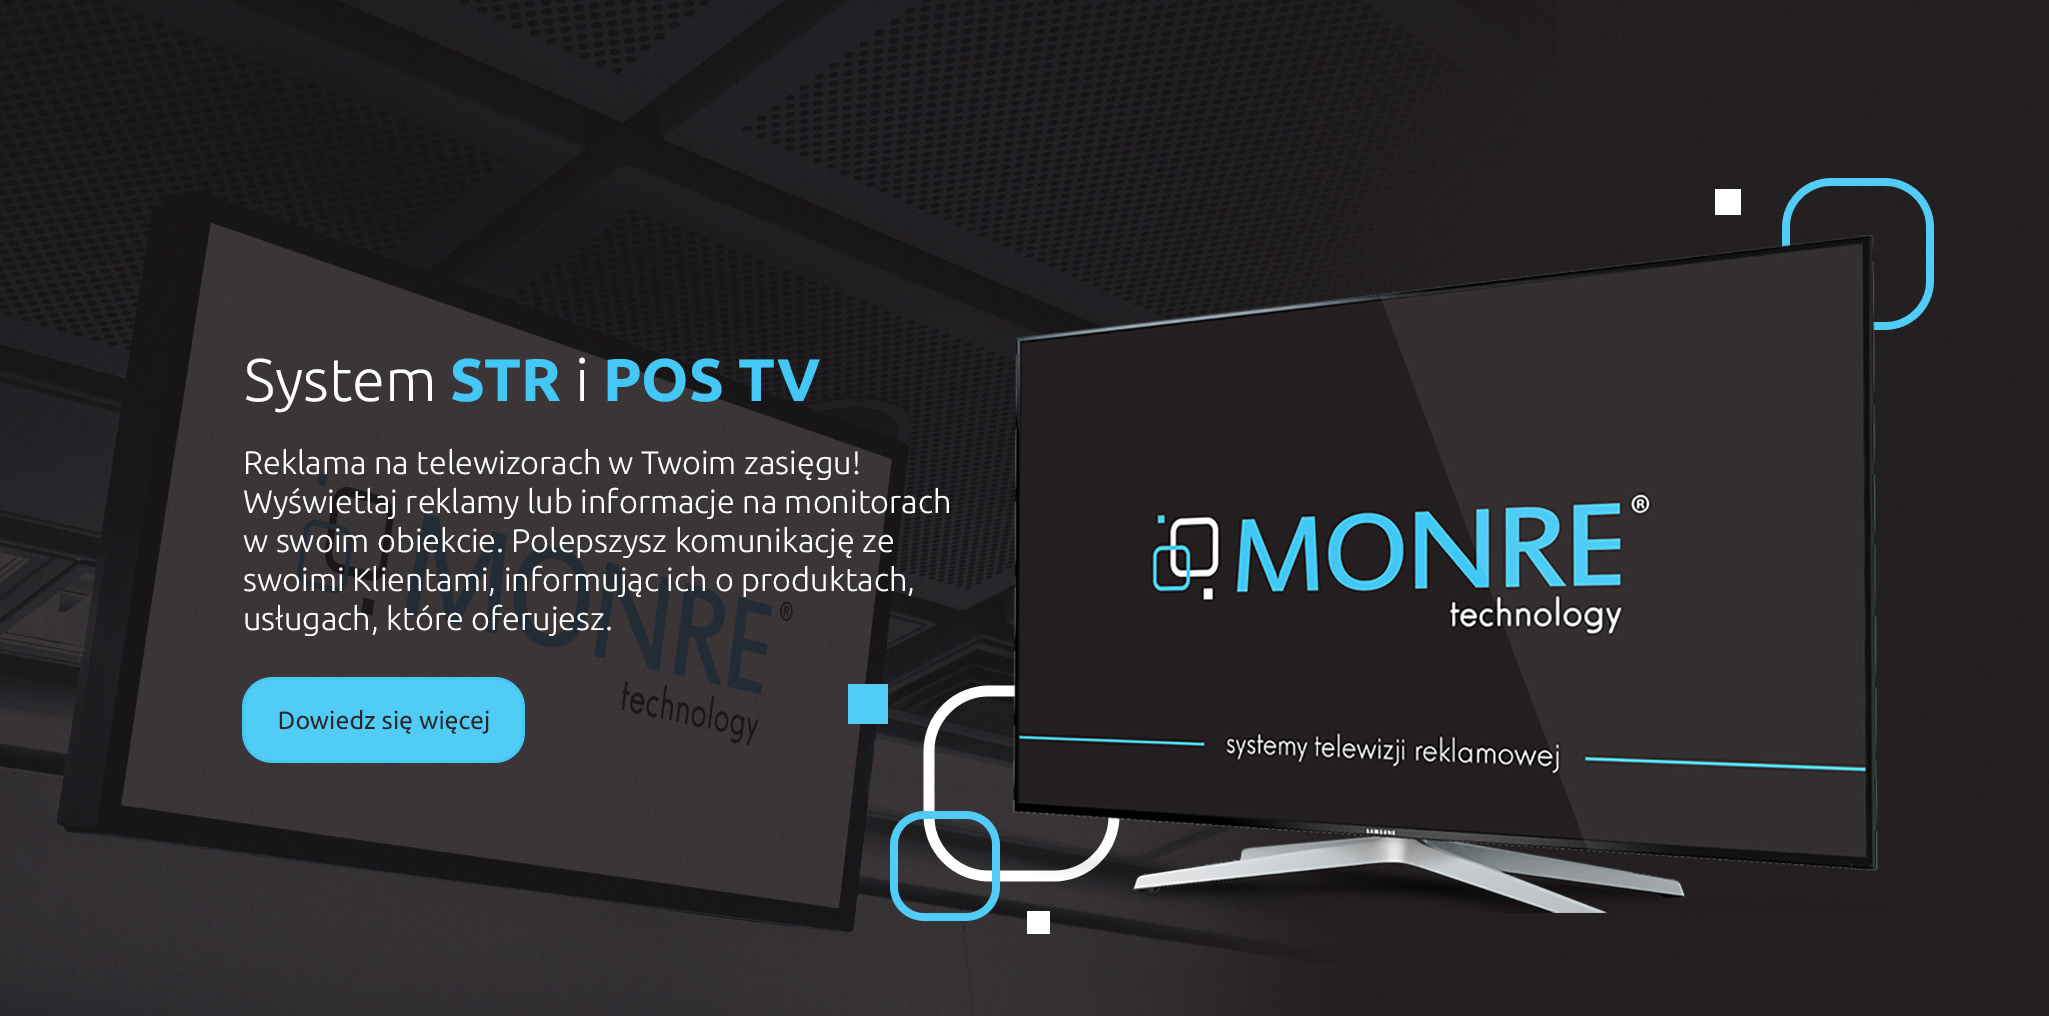 MONRE Technology - System Telewizji Reklamowej